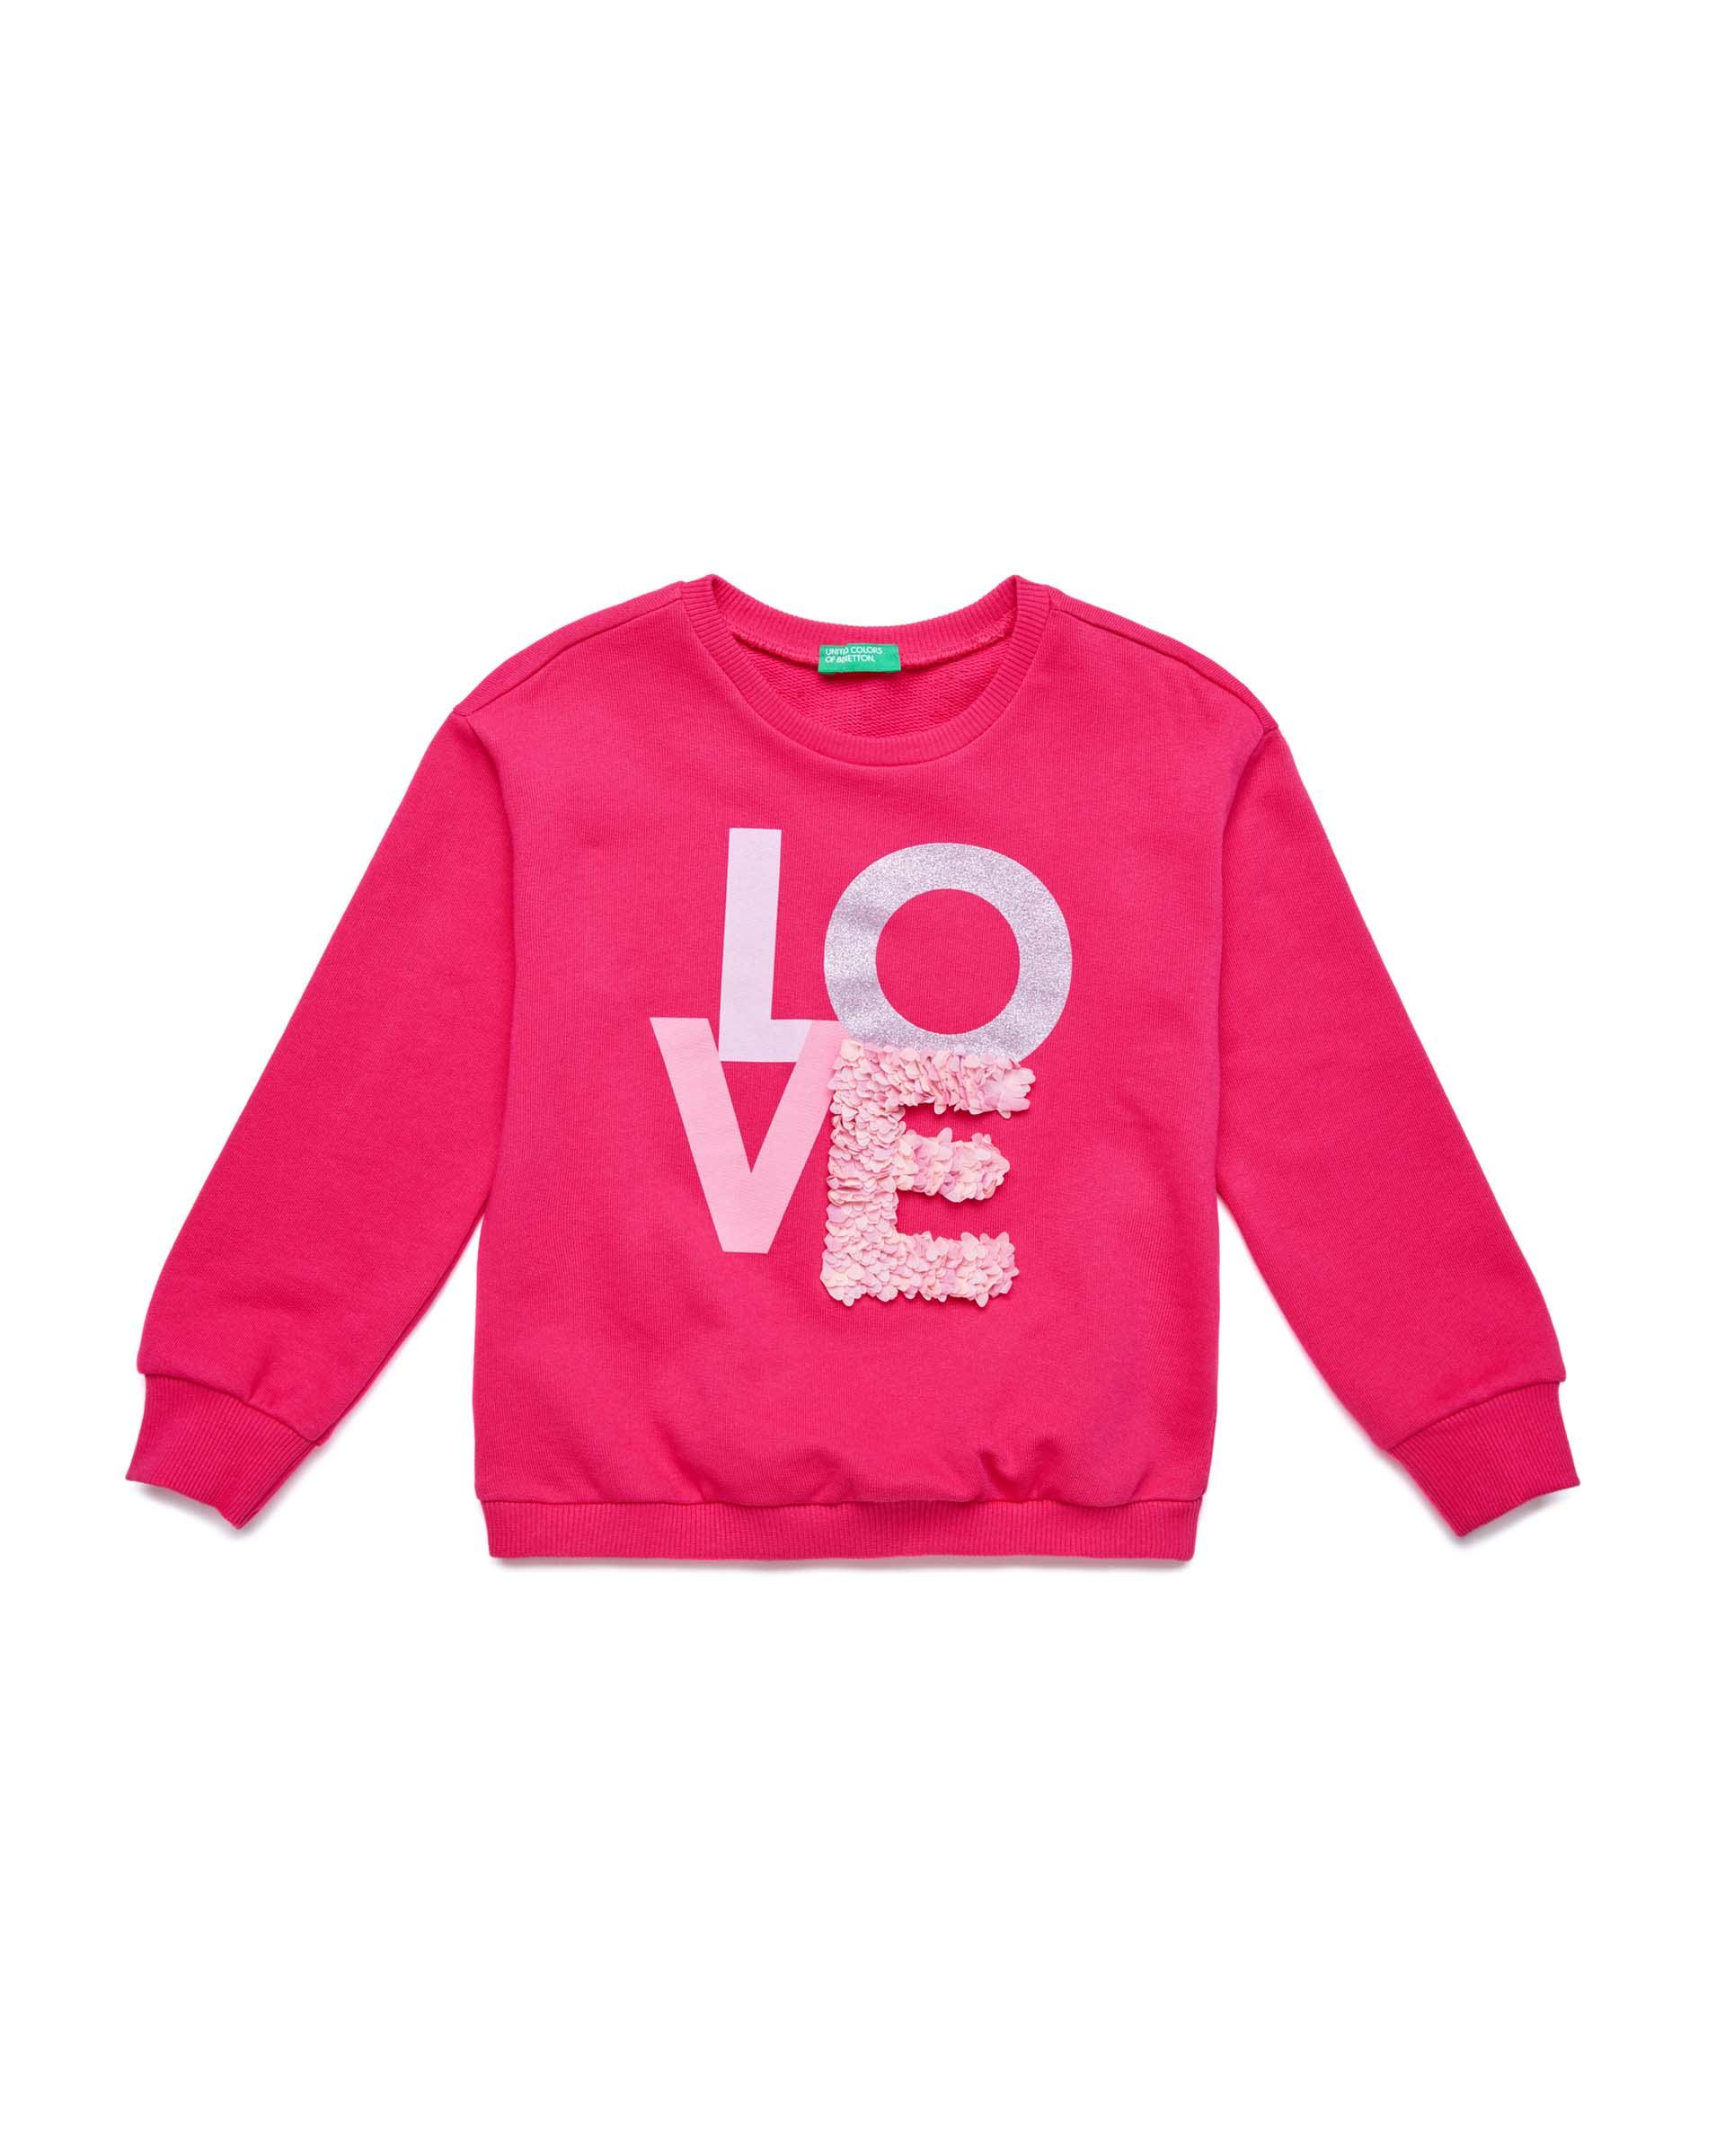 Купить 20P_3J68C14L2_2L3, Толстовка для девочек Benetton 3J68C14L2_2L3 р-р 158, United Colors of Benetton, Толстовки для девочек